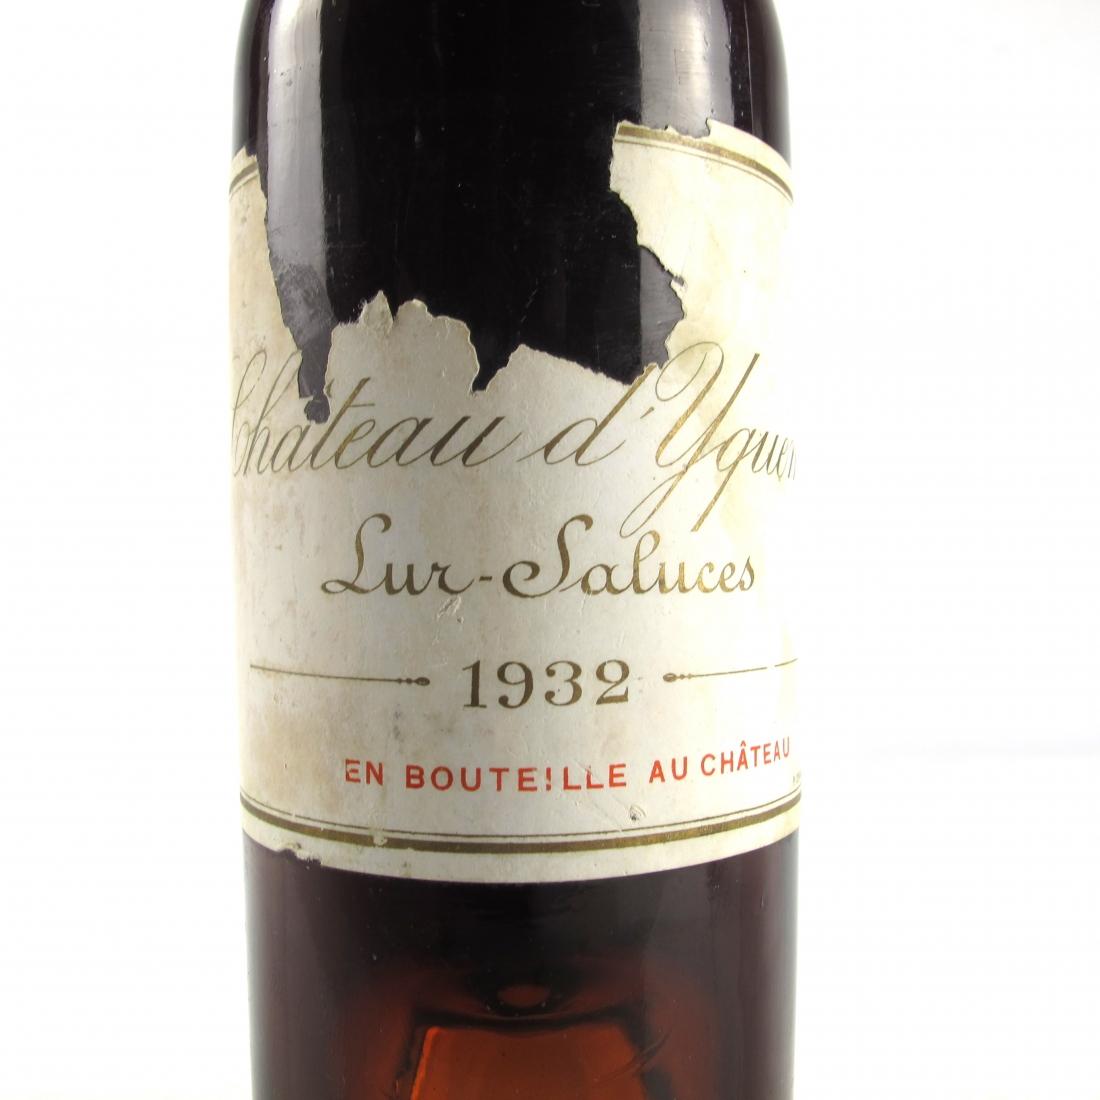 Ch. d'Yquem 1932 Sauternes 1er-Cru-Superior 37.5cl